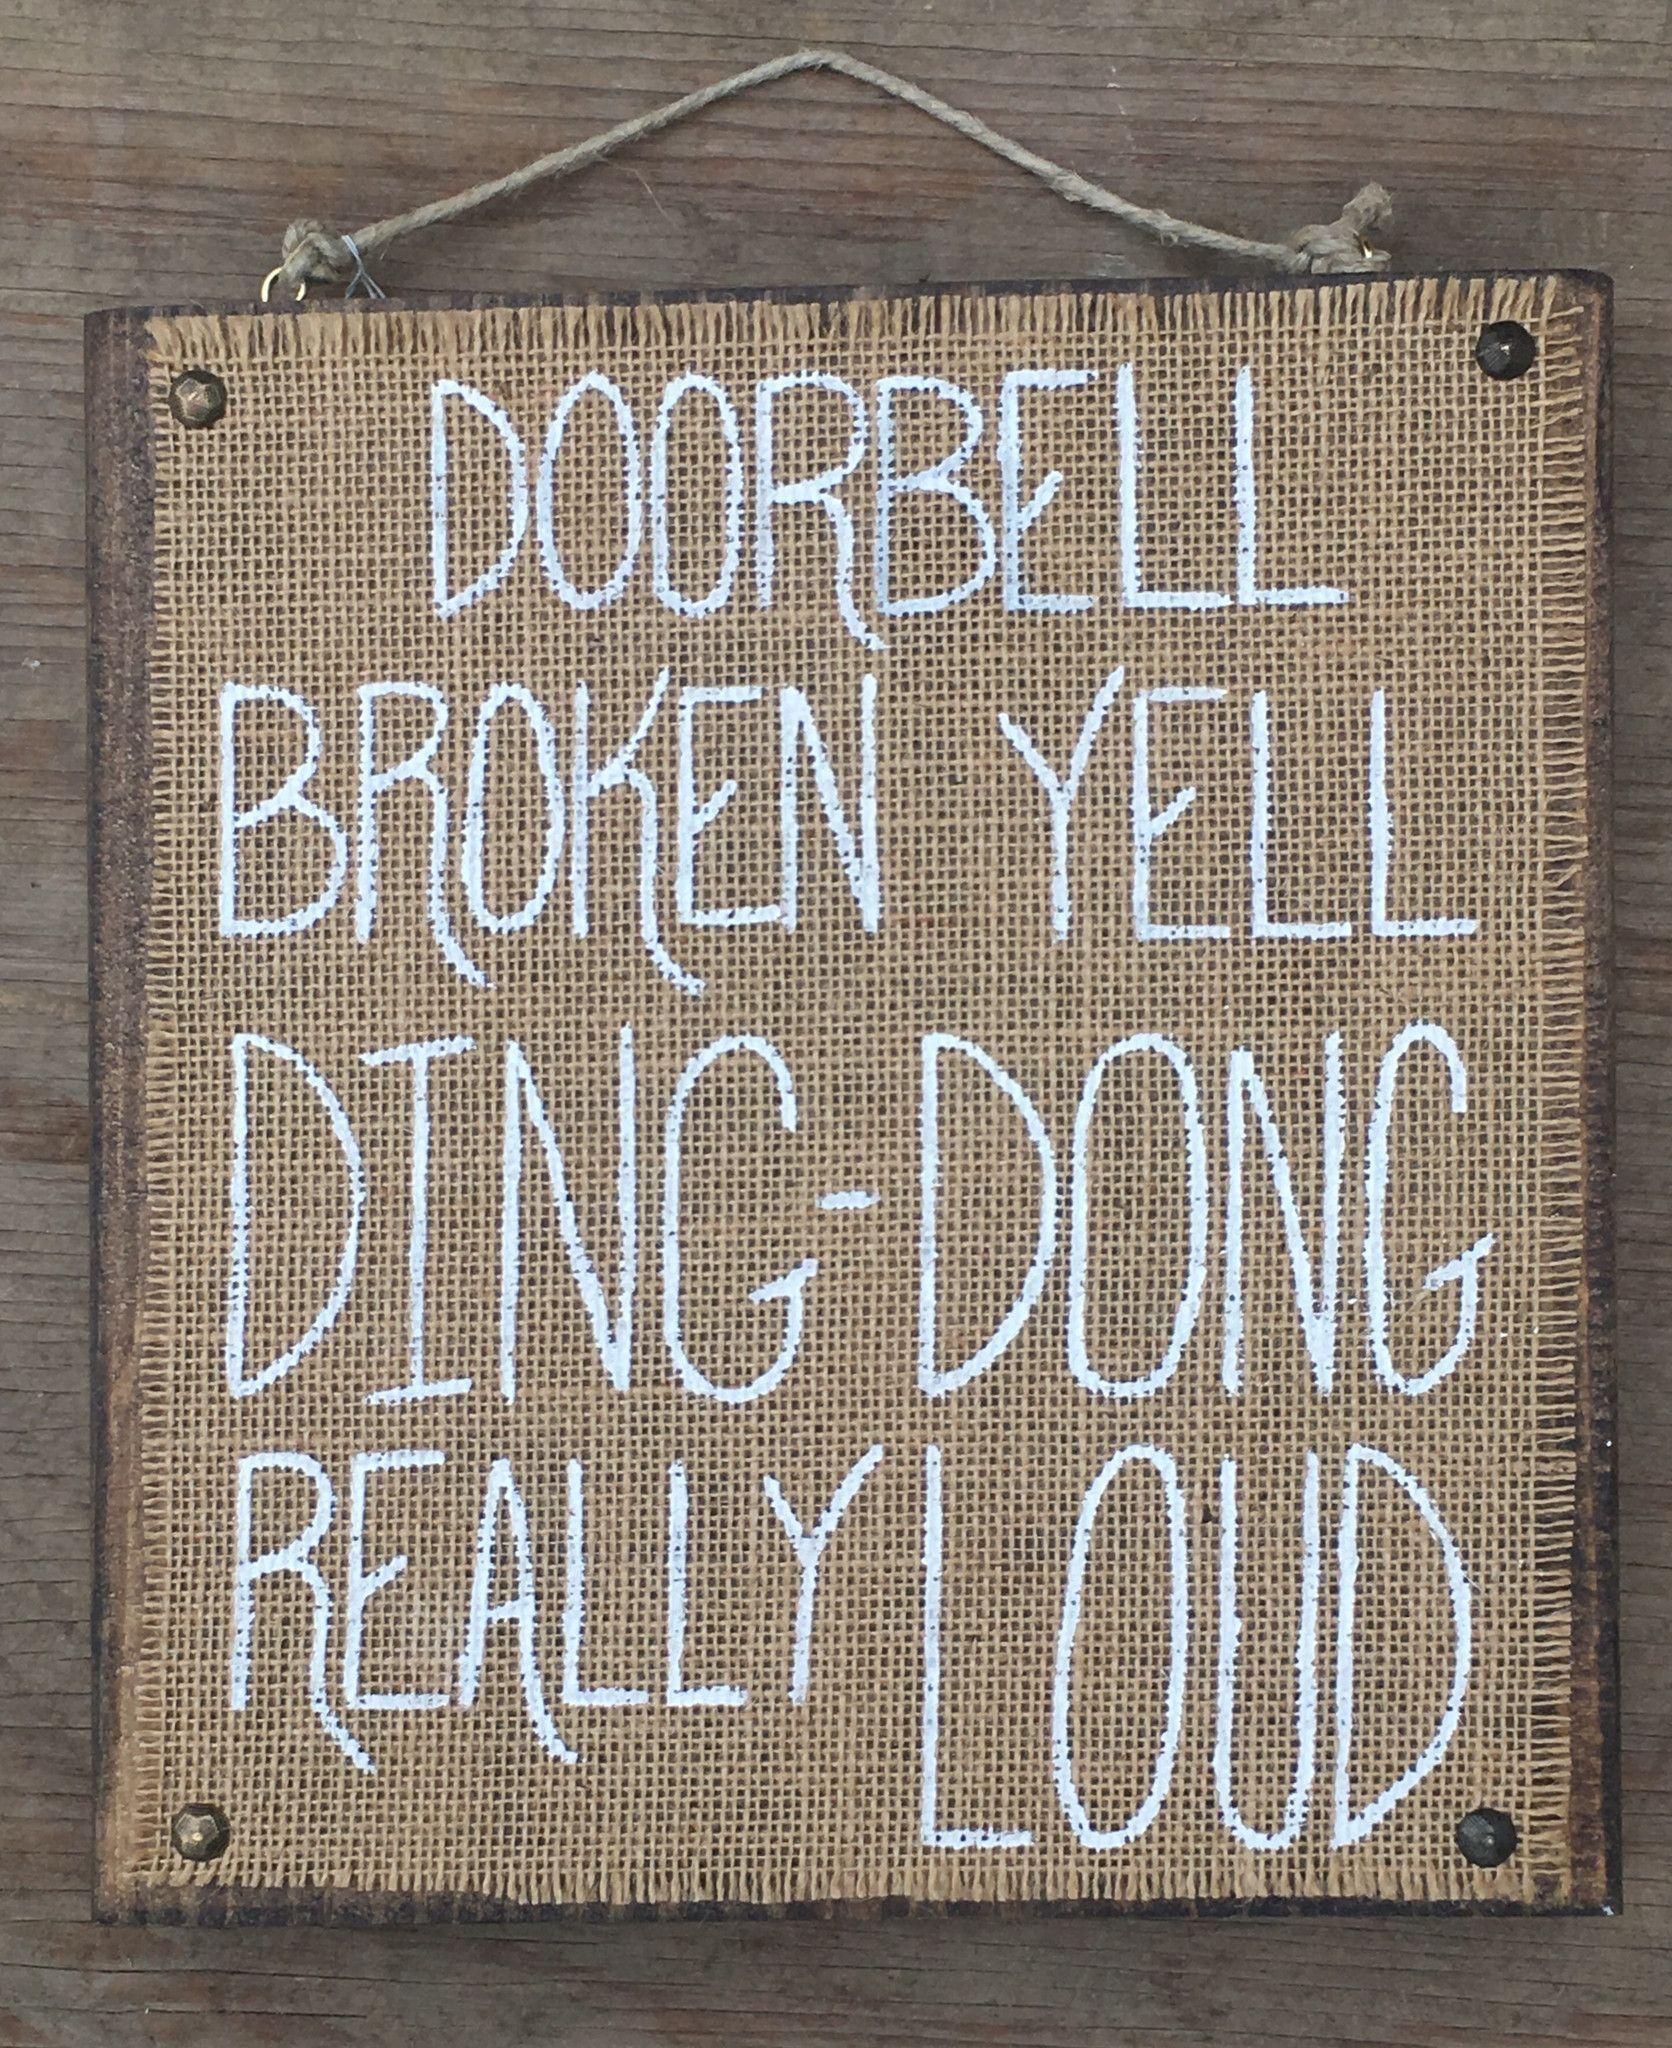 Best Doorbell Broken Yell Ding D*Ng Really Loud Wood Sign 400 x 300